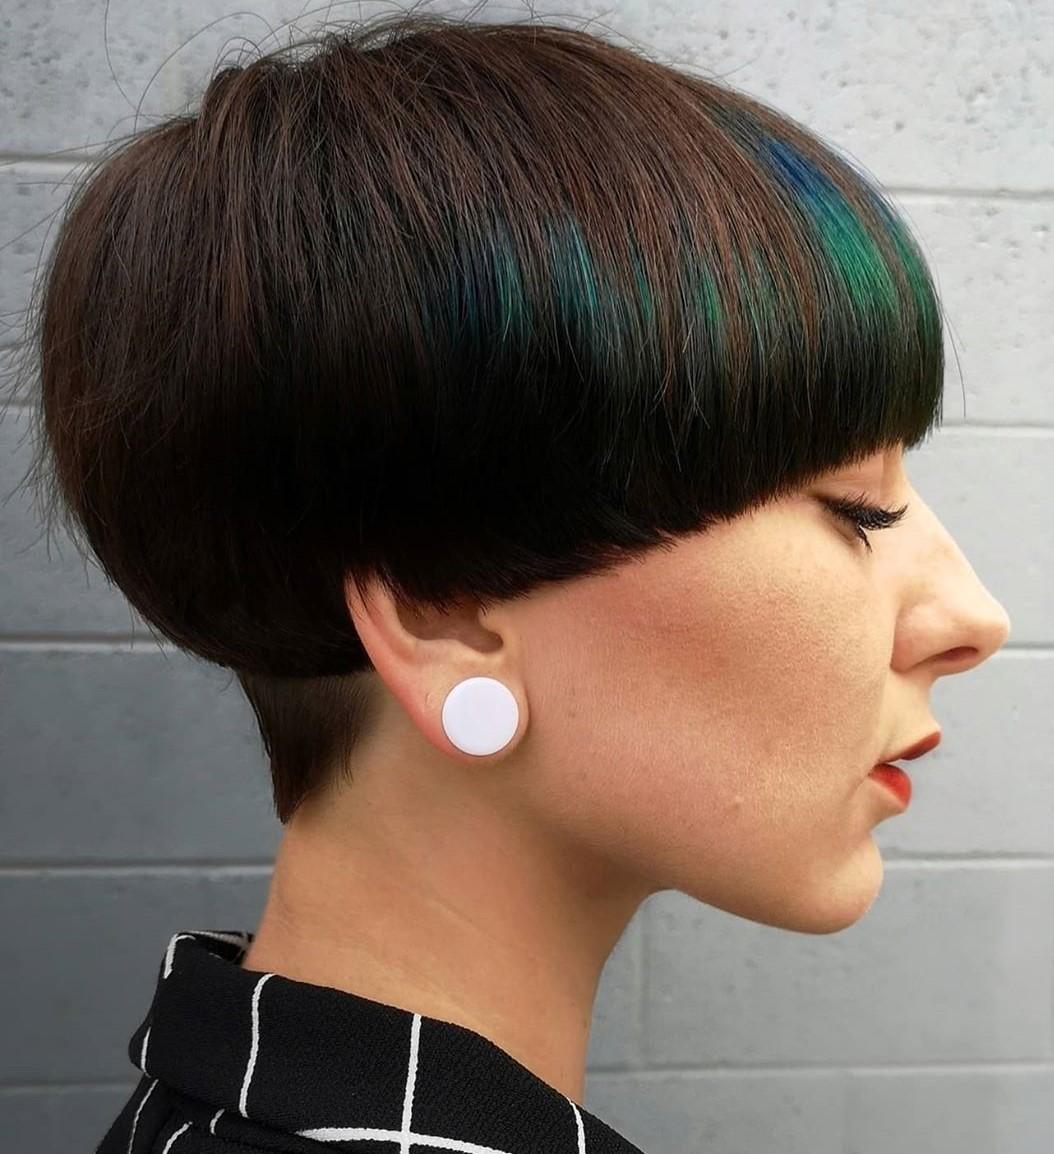 Accurate Mushroom Cut Pixie with Bangs